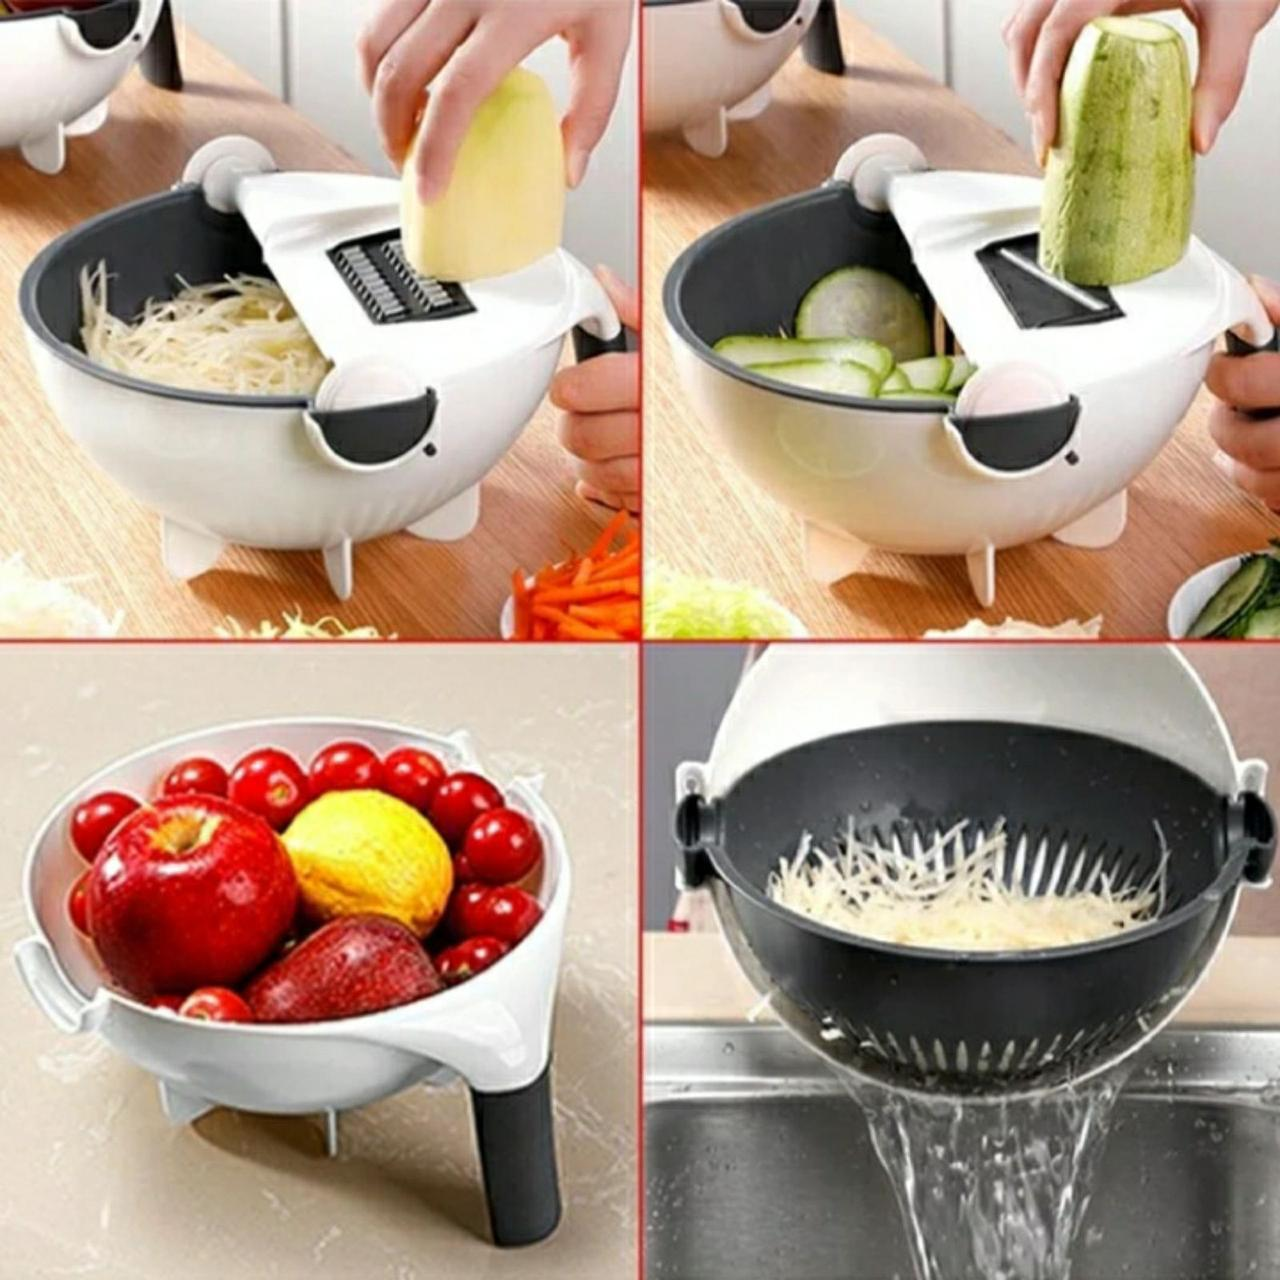 Мультислайсер-Терка-Овощерезка Basket Vegetable Cutter